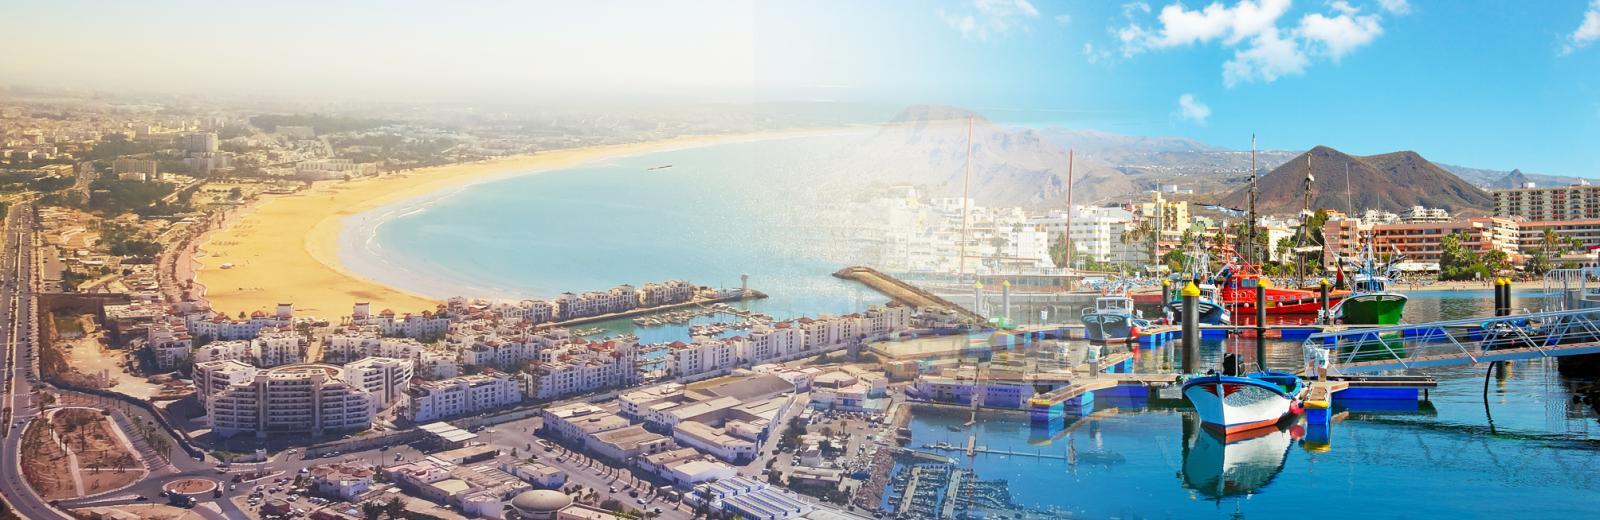 Séjours combinés à Tenerife & Agadir